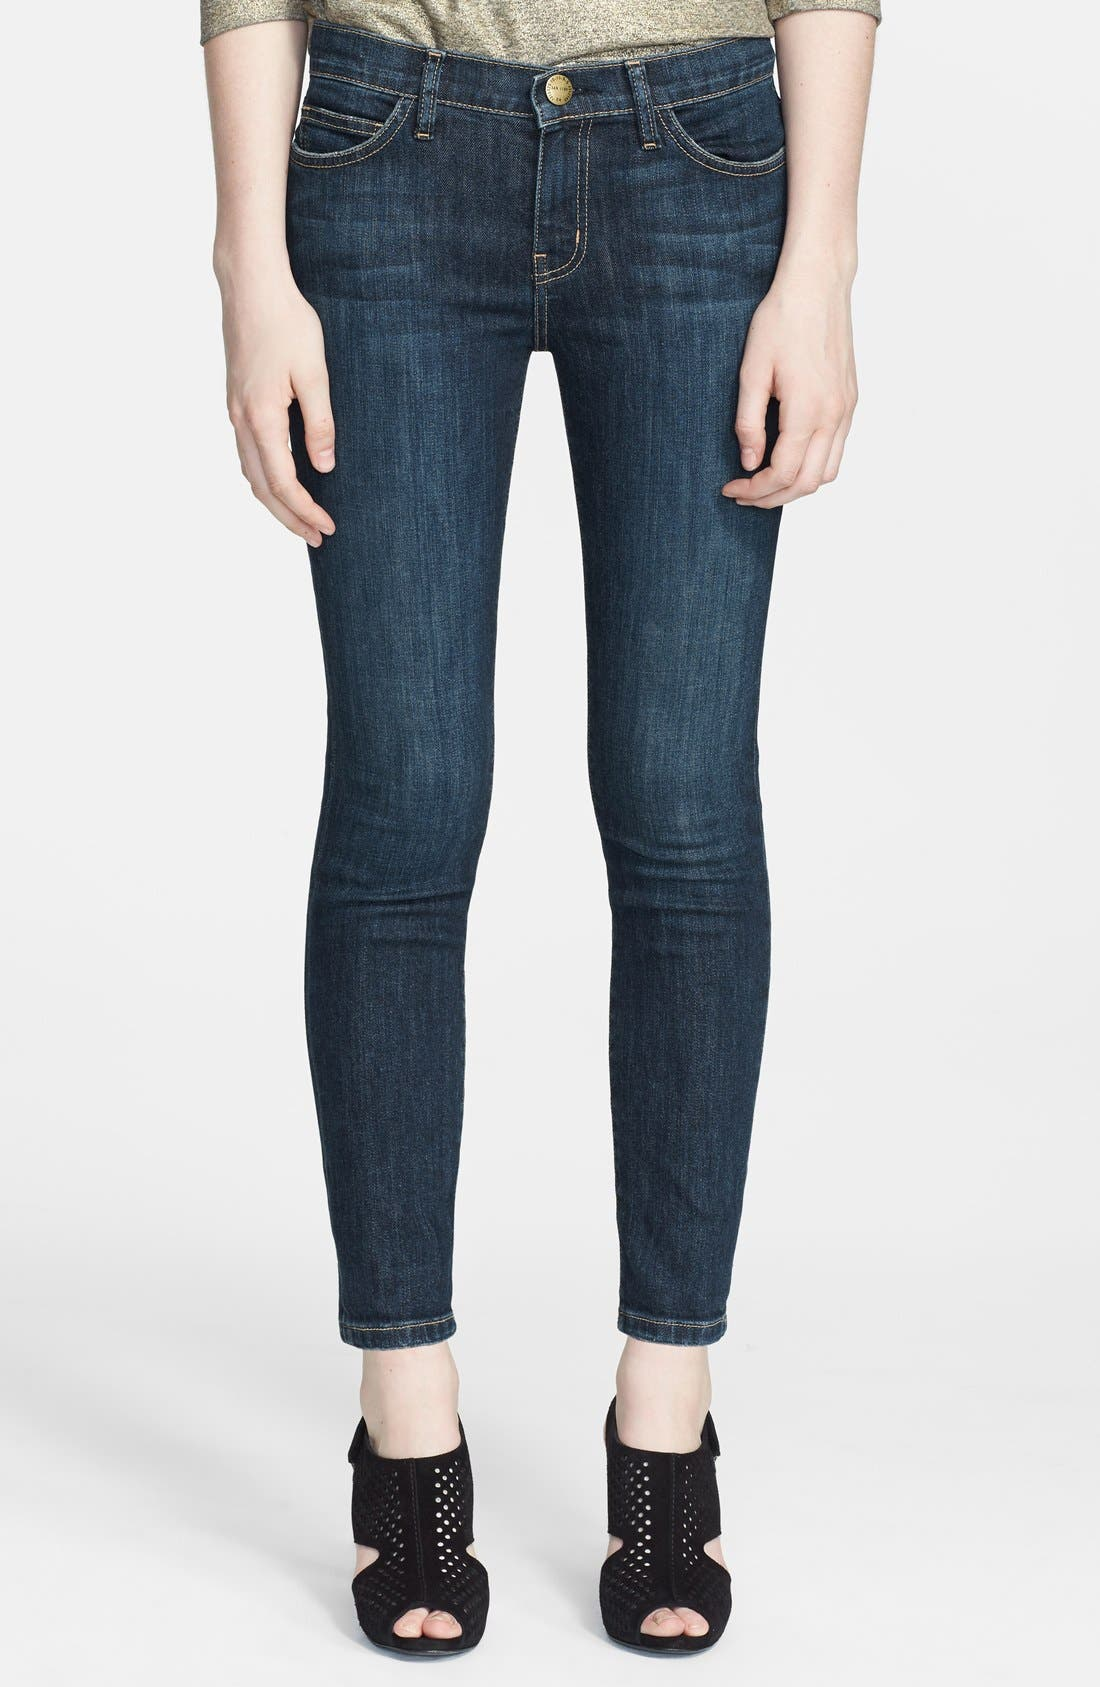 Alternate Image 1 Selected - Current/Elliott 'The Stiletto' Skinny Jeans (Alumni)